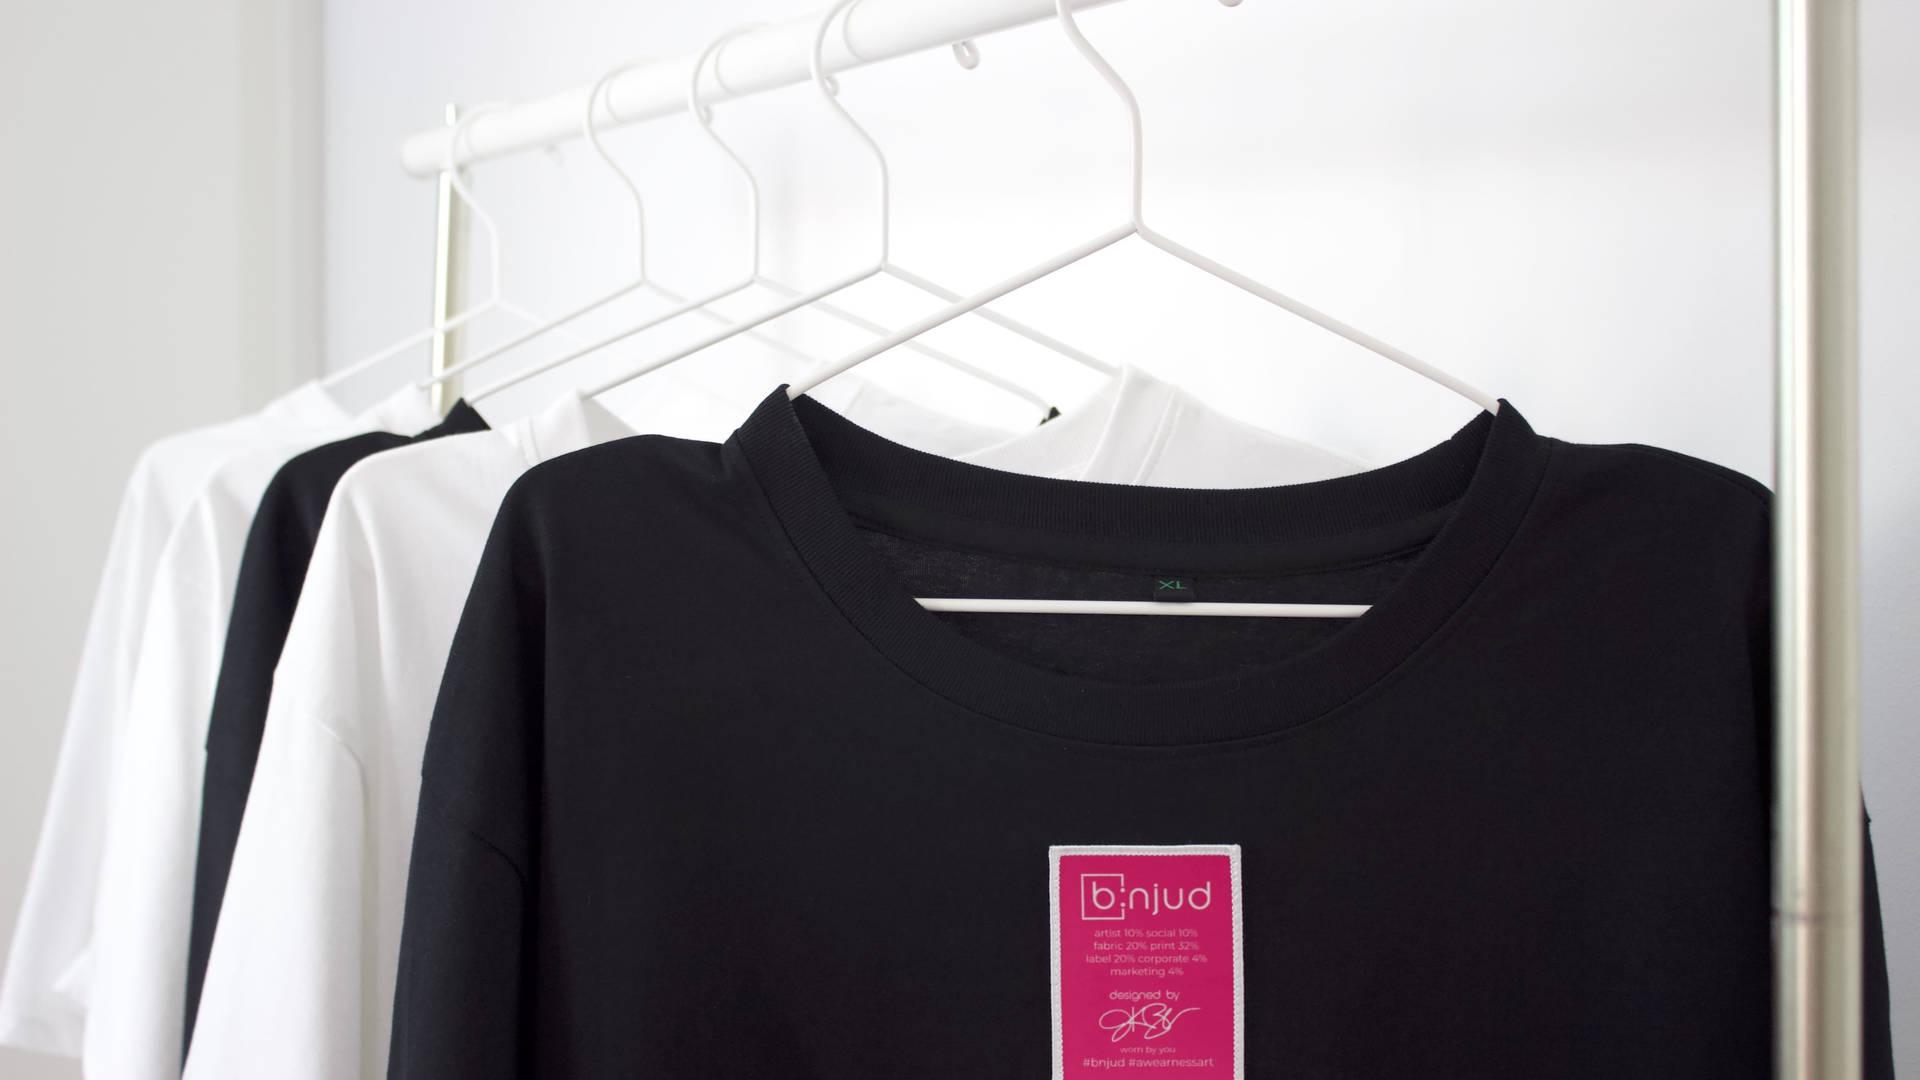 bnjud-wardrobe